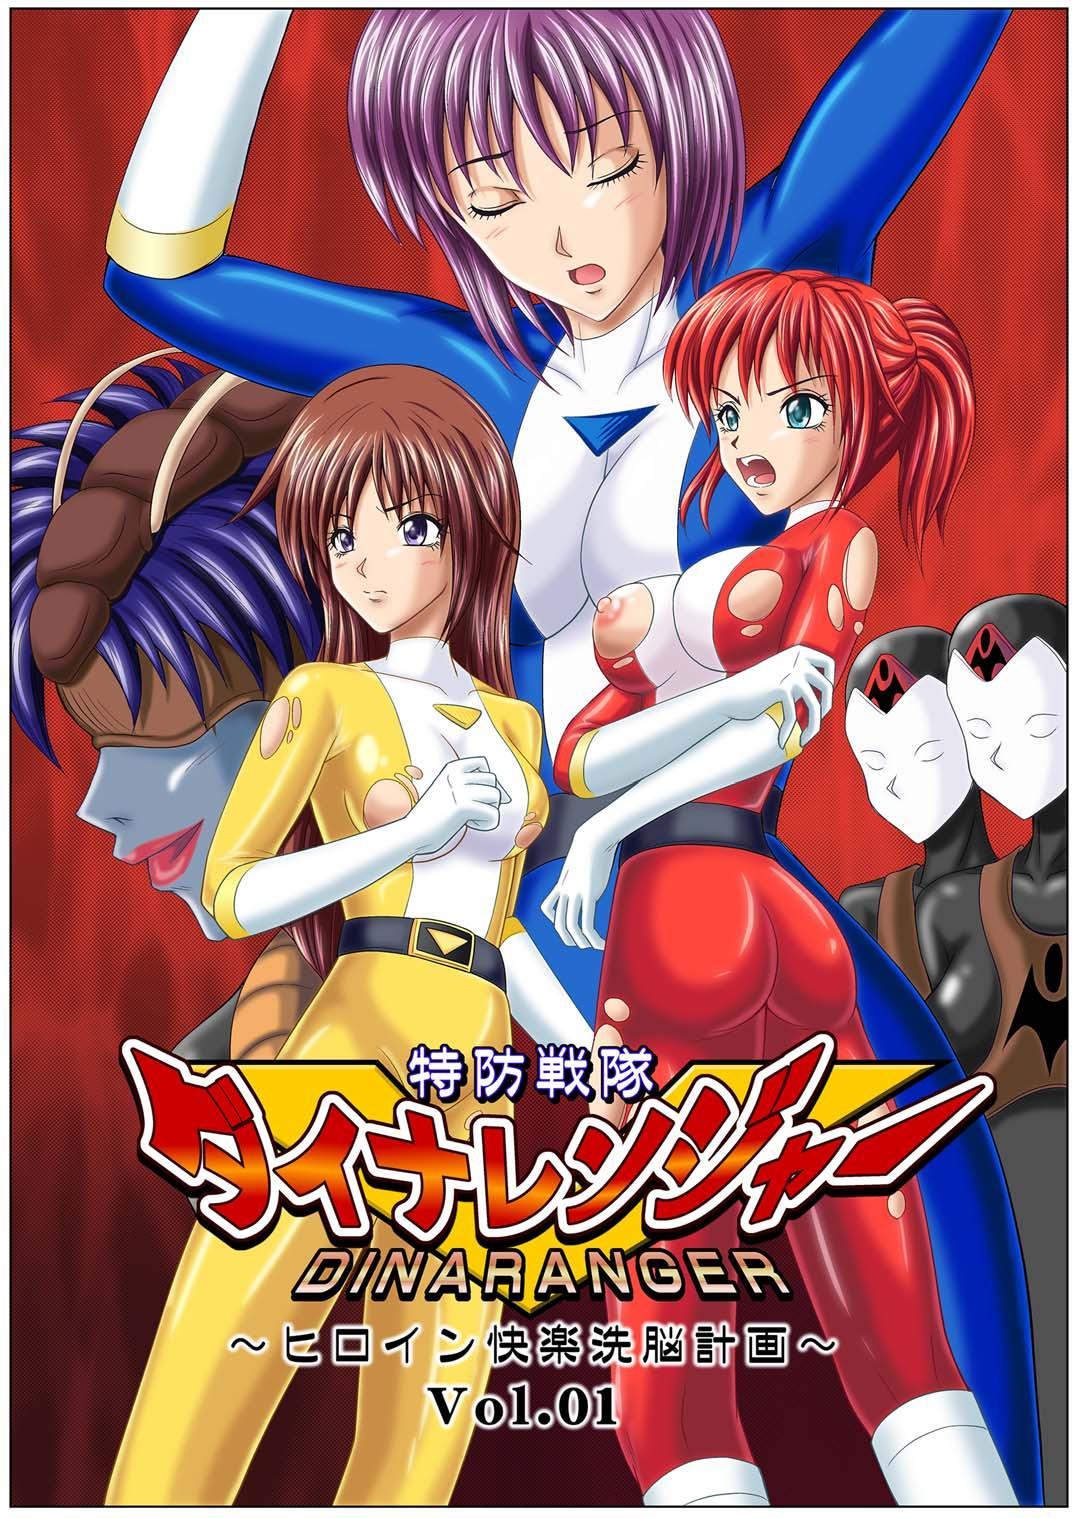 [Macxe's (monmon)] Tokubousentai Dinaranger ~Heroine Kairaku Sennou Keikaku~ Vol.01/02/03 (Renkaban) [Digital] 1